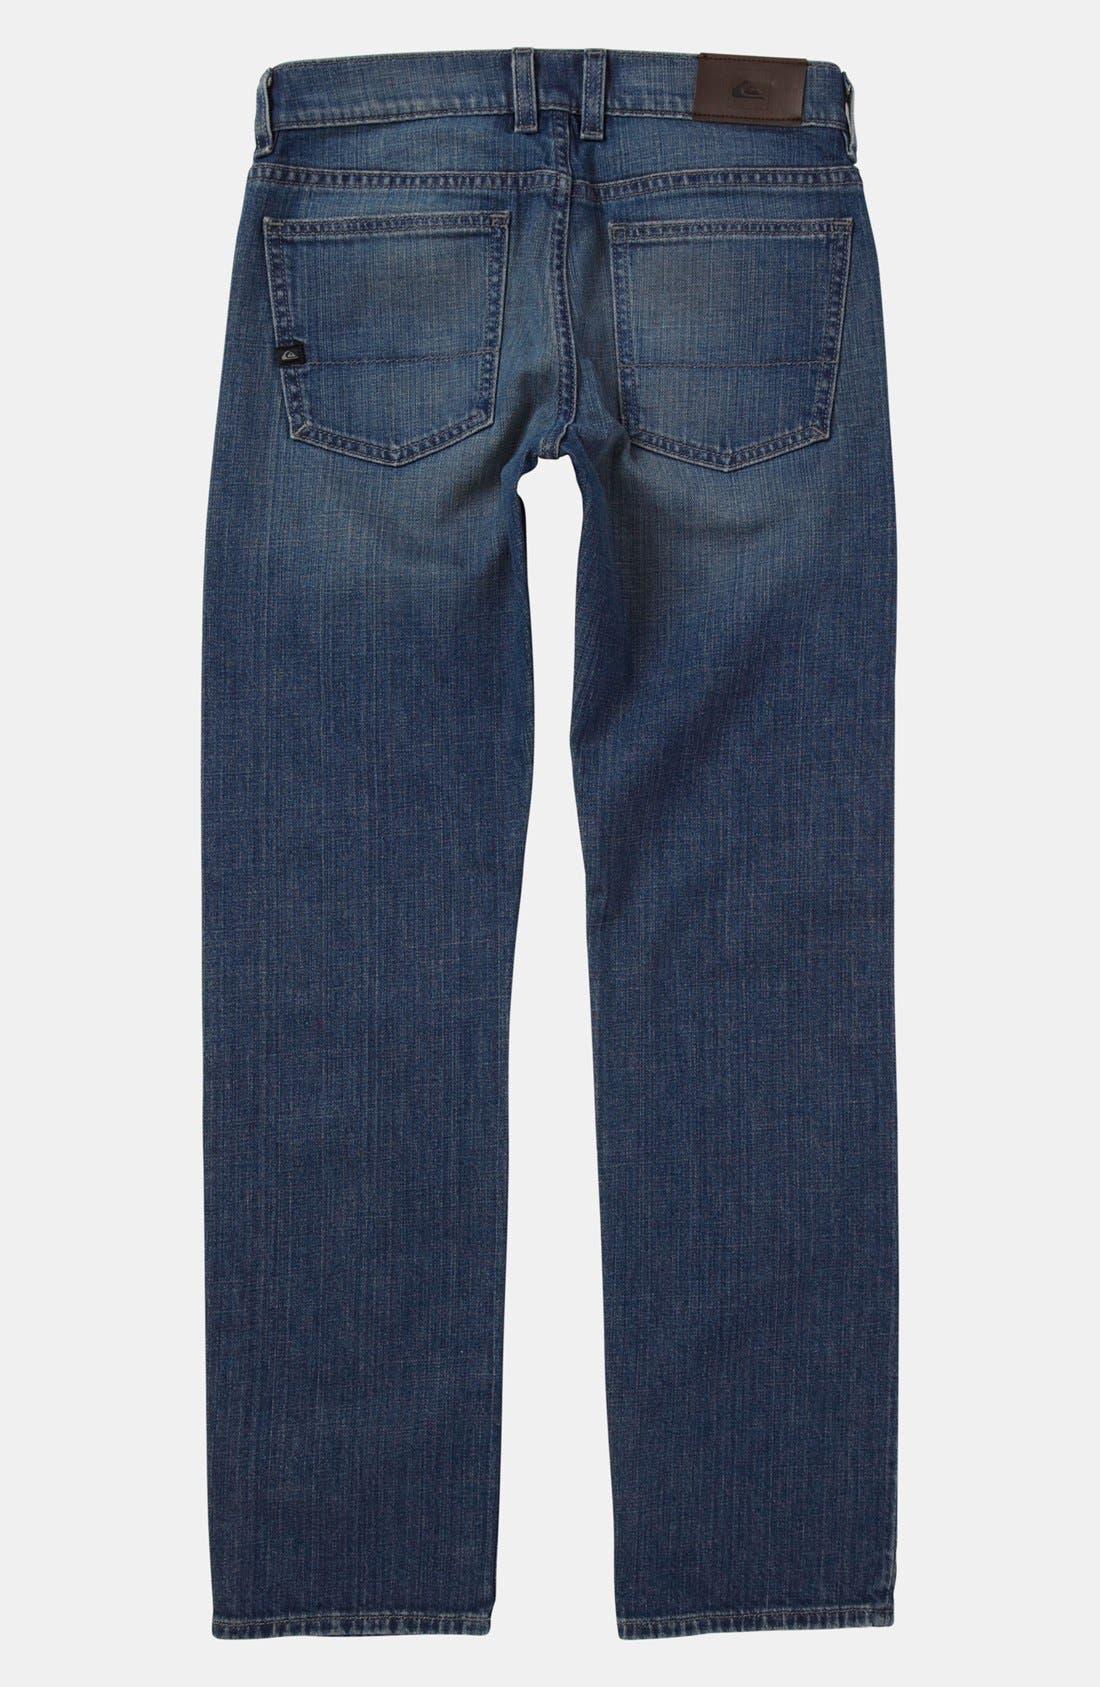 Main Image - Quiksilver 'Distortion' Straight Leg Jeans (Little Boys)